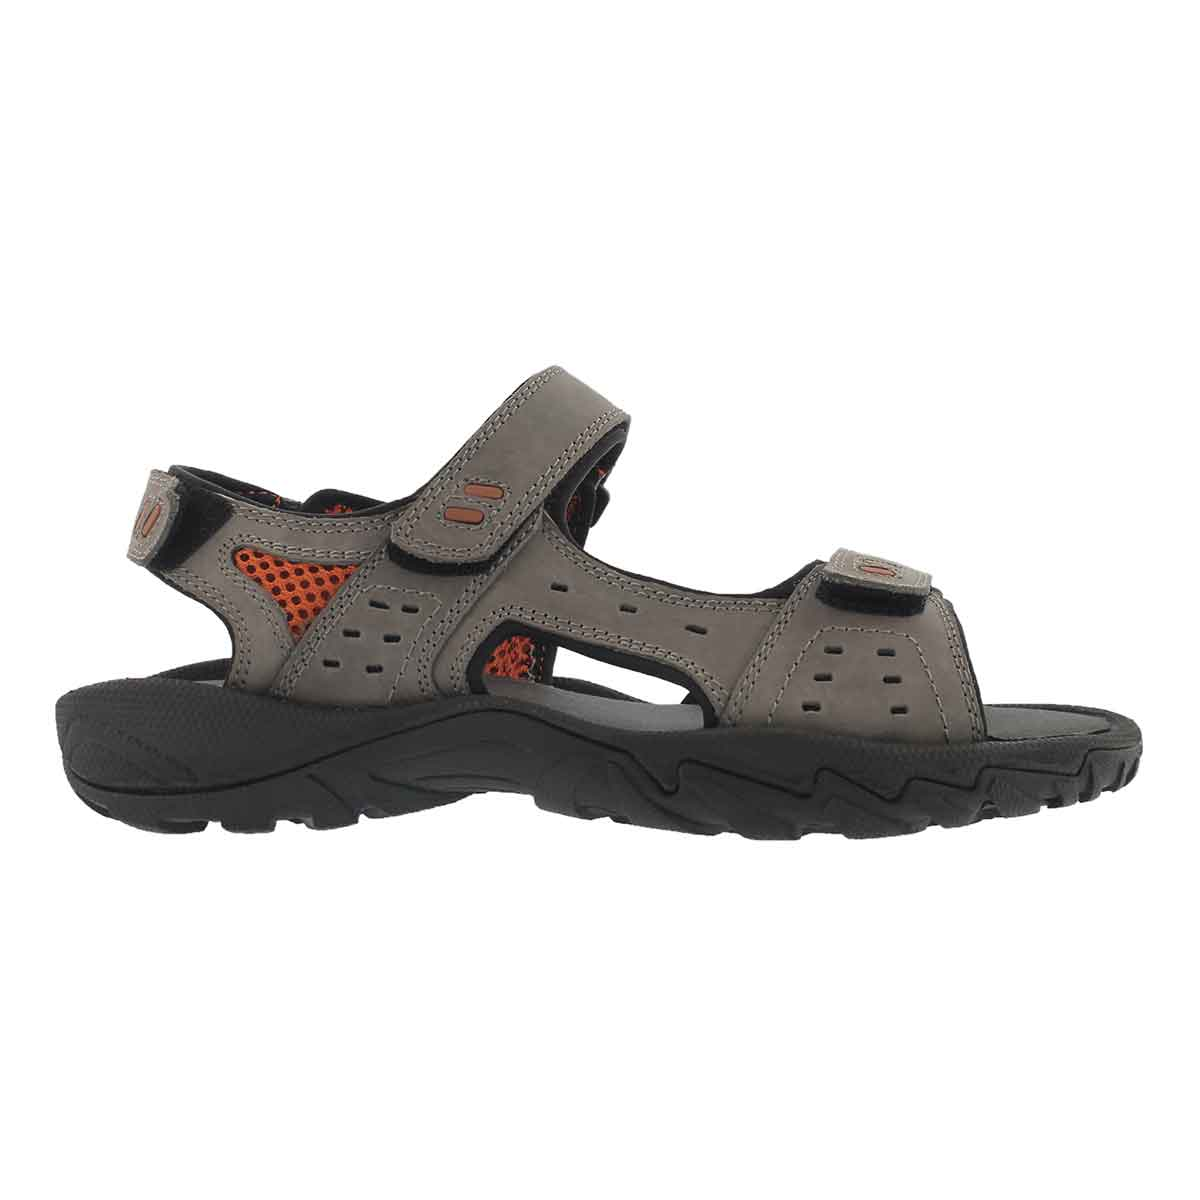 Mns Lucius 3 grey 3 strap sport sandal